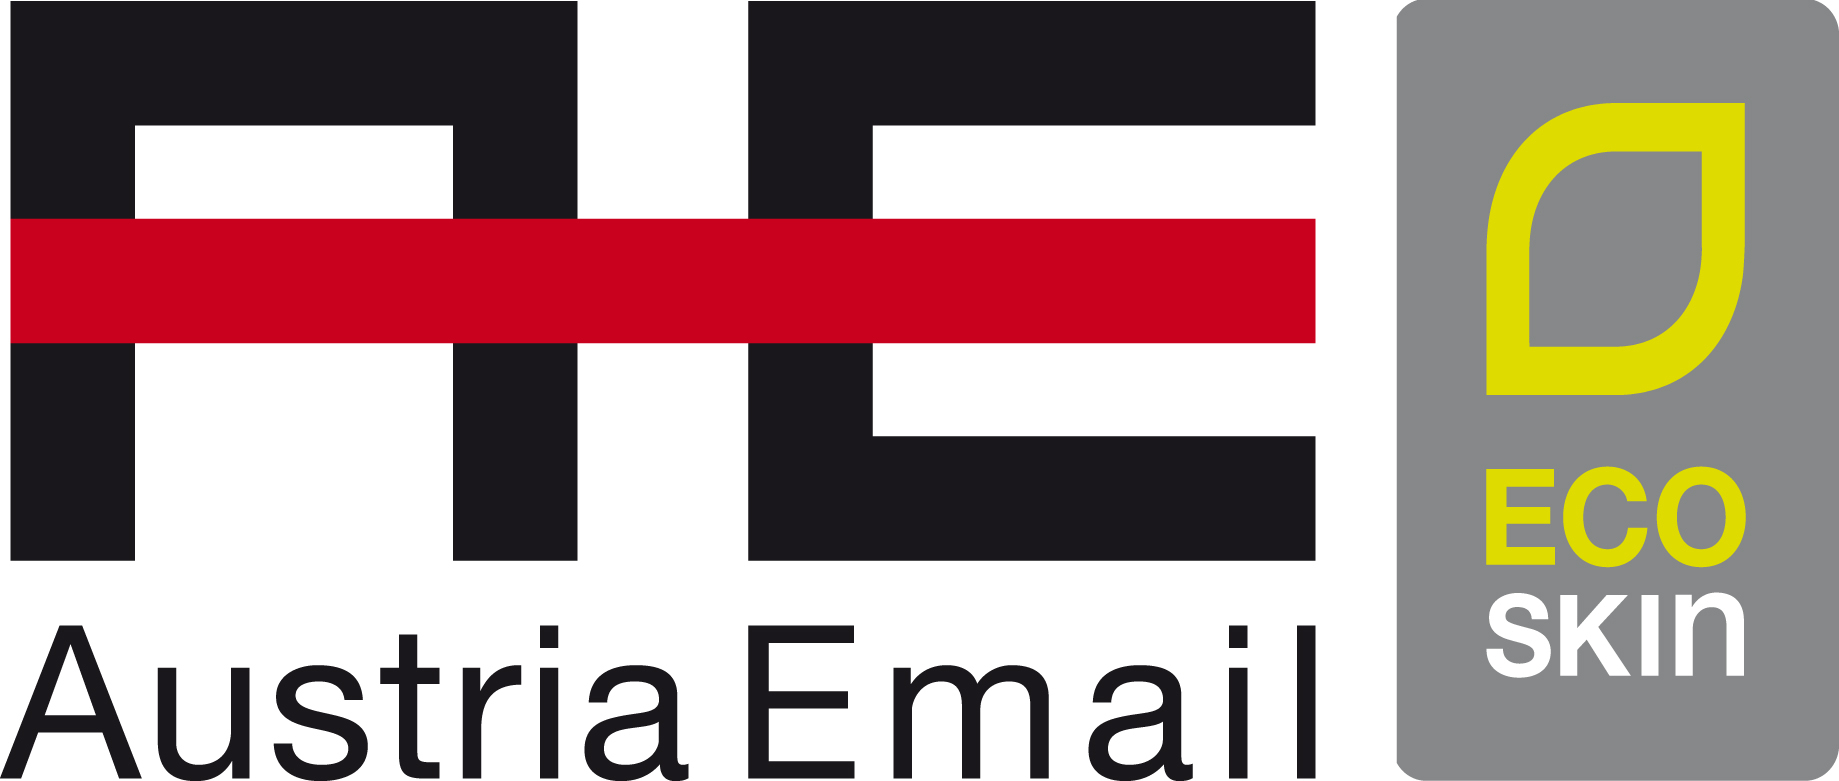 Austria_Email.jpg